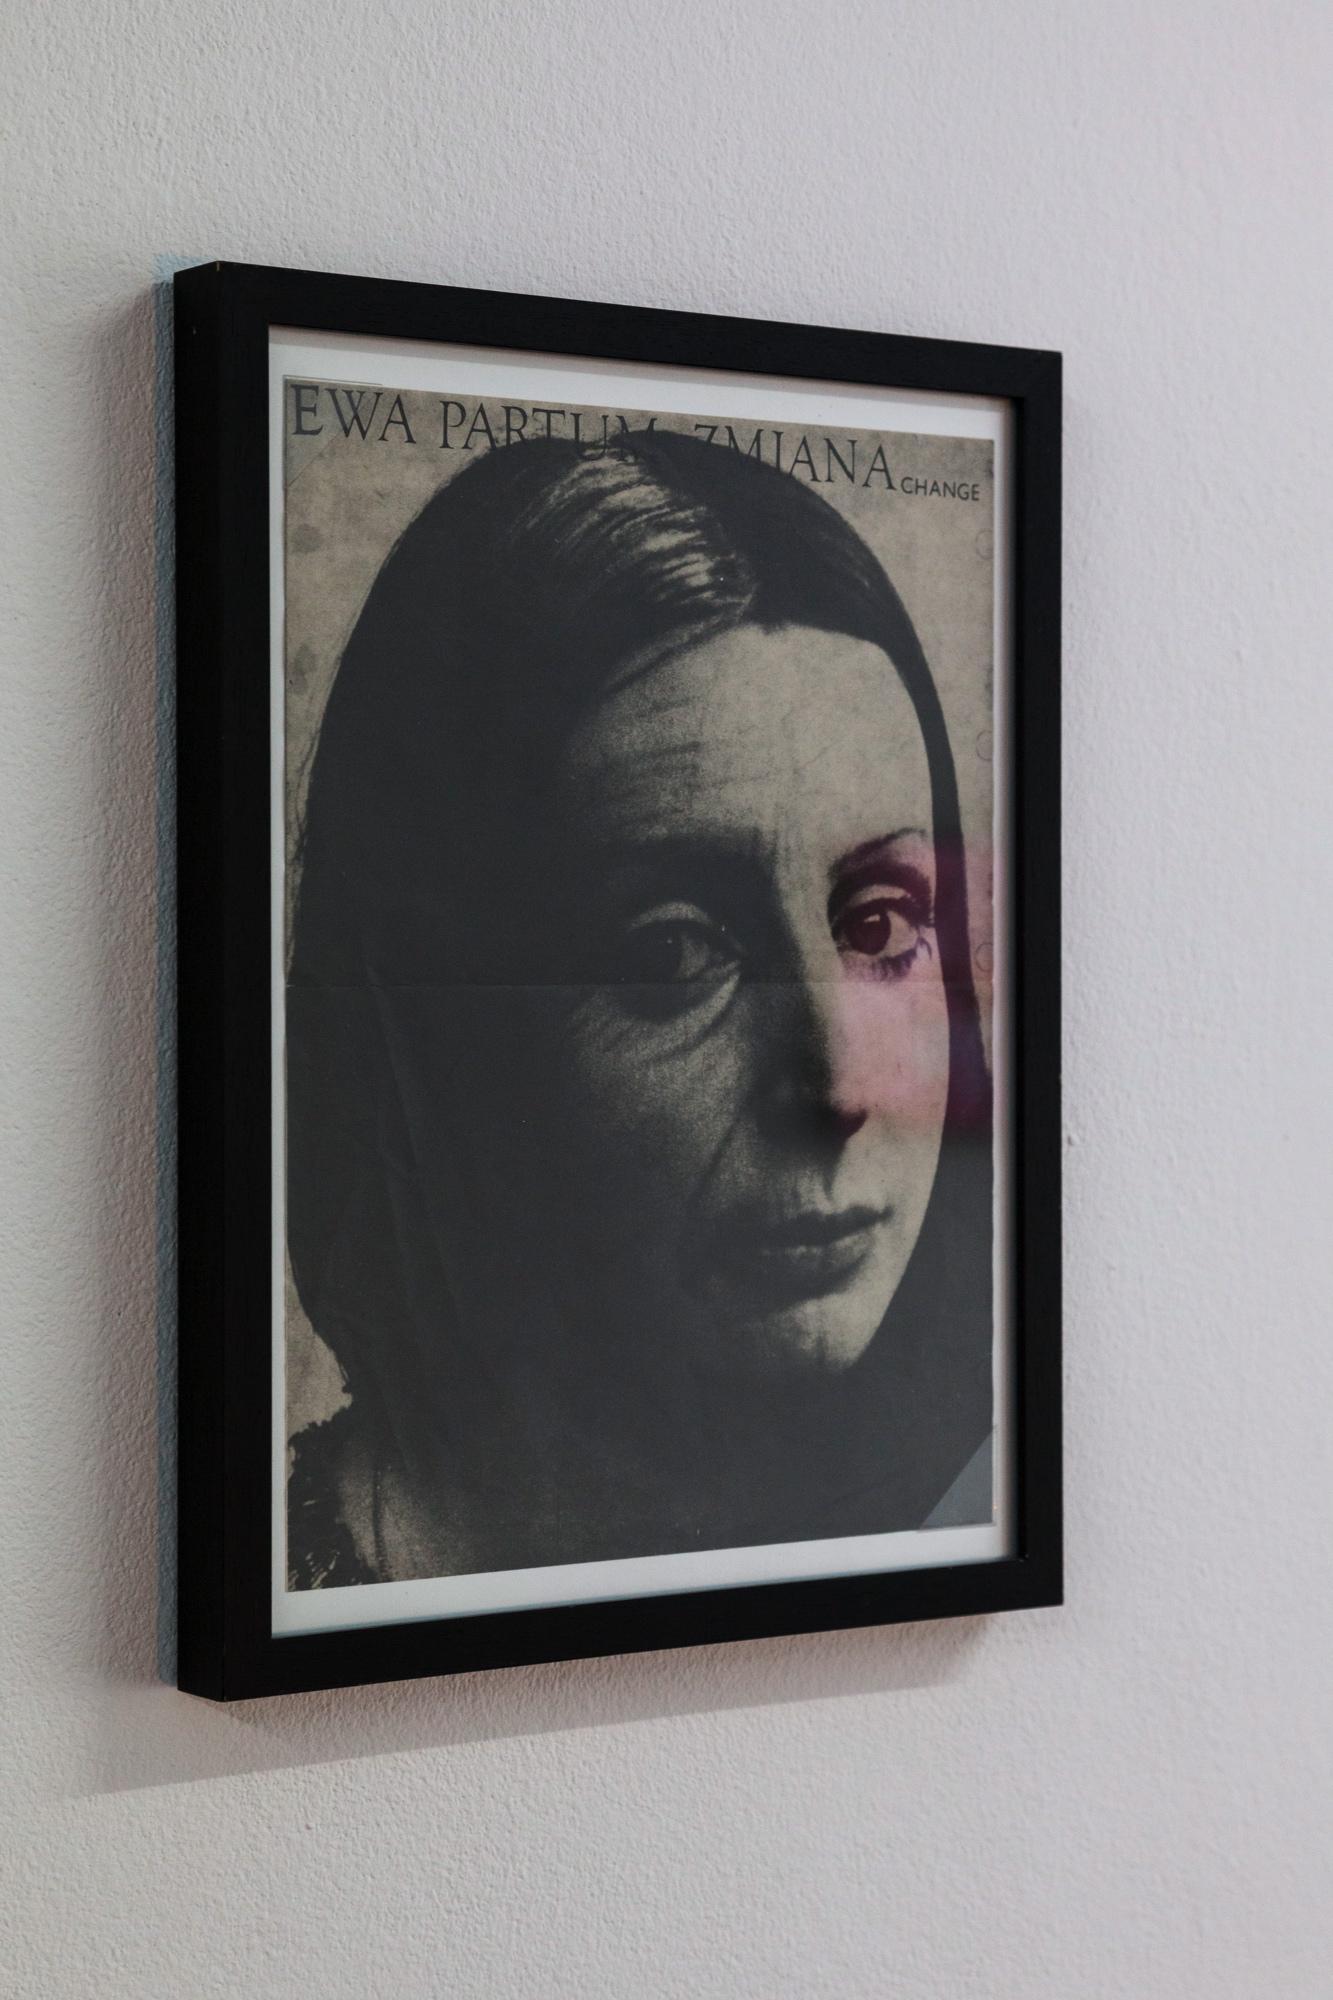 Ewa Partum Zmiana change, 1974,Offsetprint, signed on back, 36,5 x 27,5 cm, framed,  Courtesy M + R Fricke, Berlin